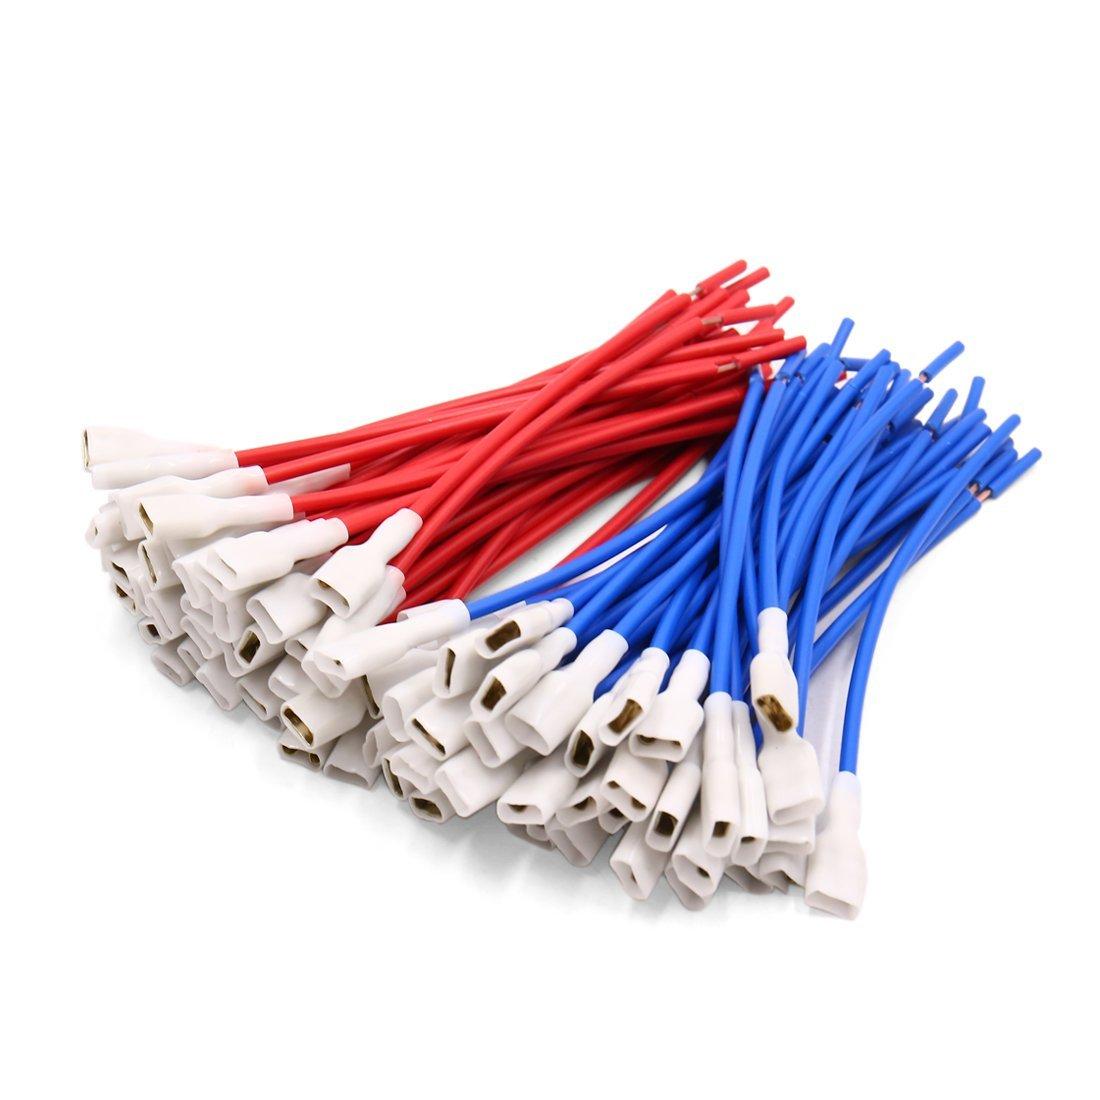 Cheap Speaker Wire Connector Types, find Speaker Wire Connector ...